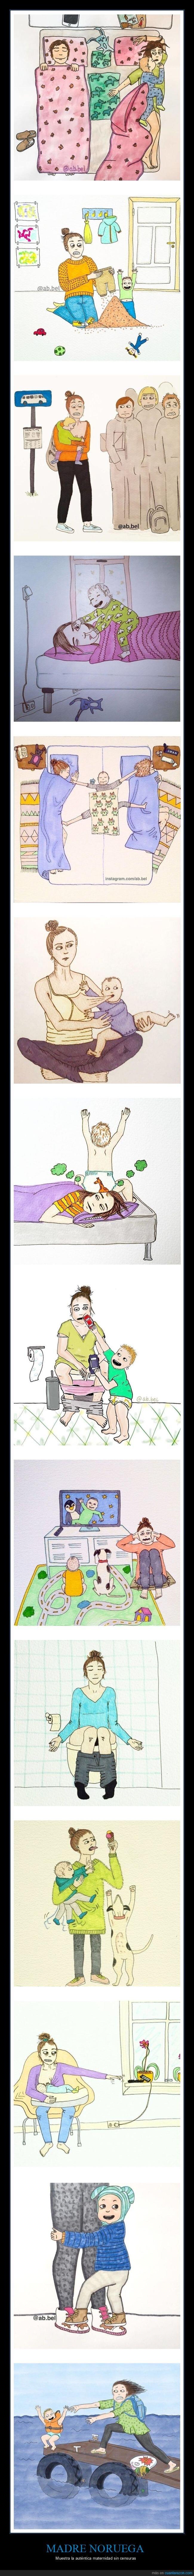 hijos,madre,maternidad